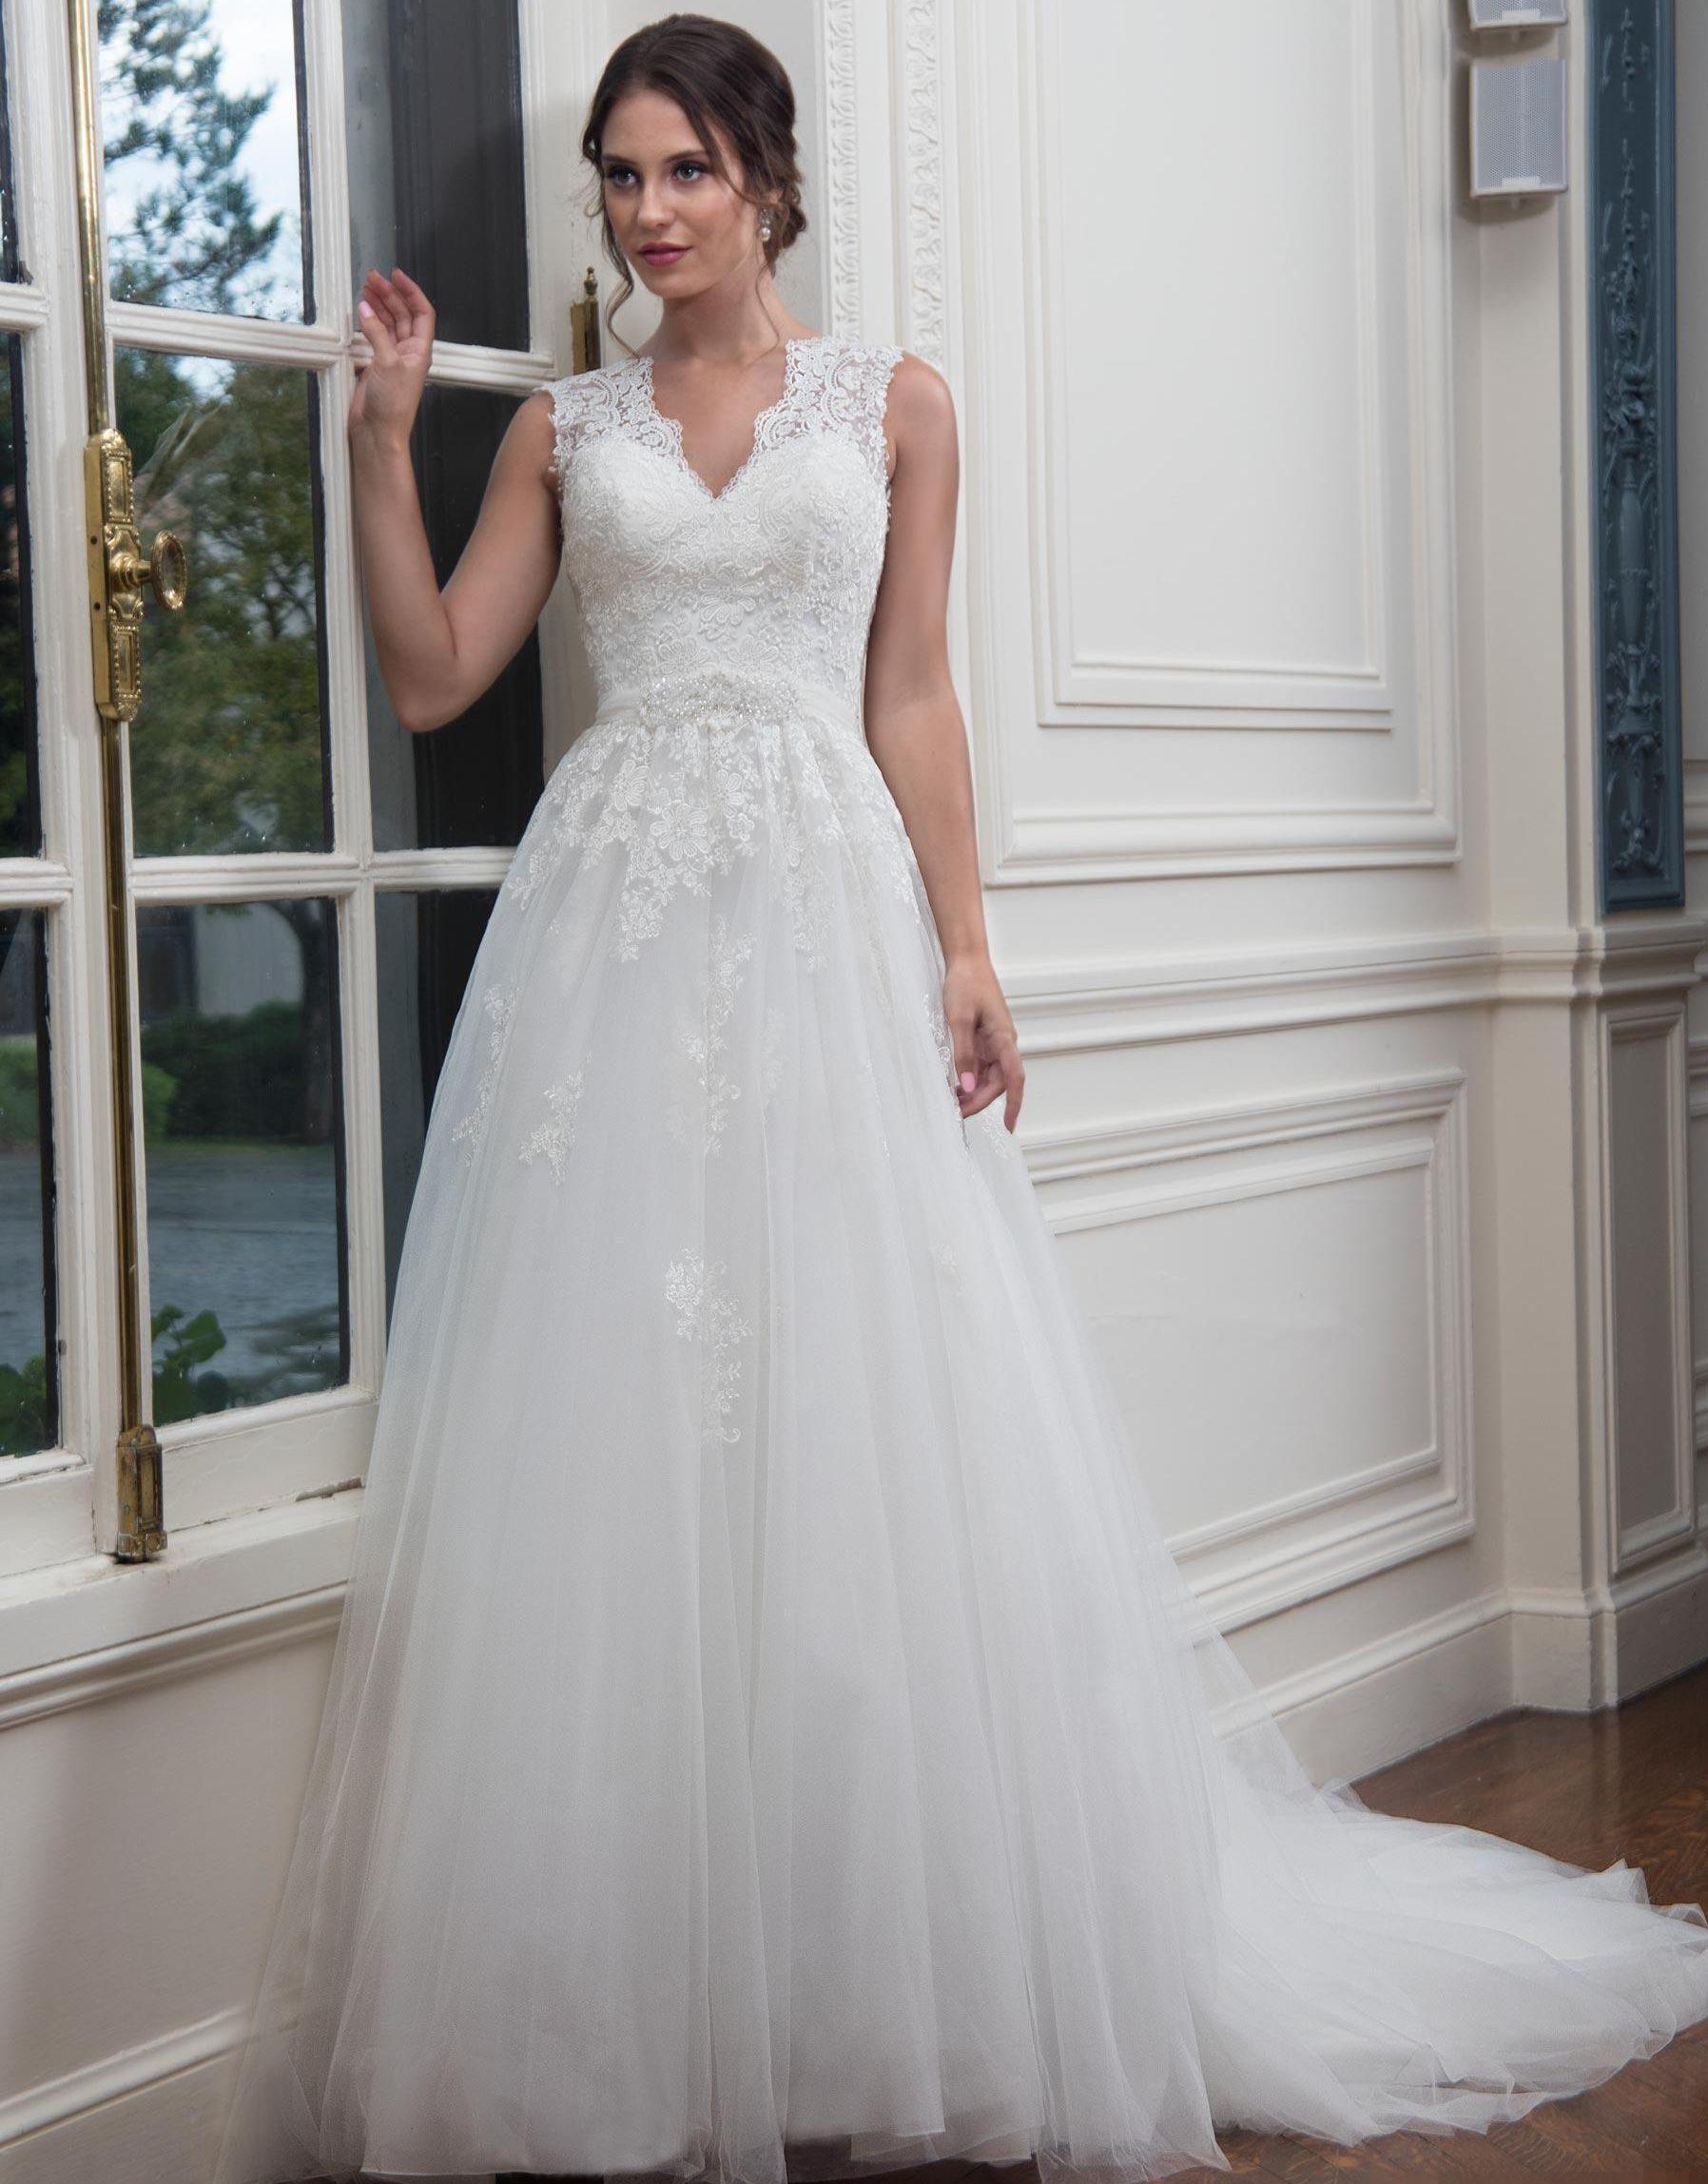 Vintage Country Wedding Dresses V Neck Appliqued A Line Tulle Bridal Gown Custom